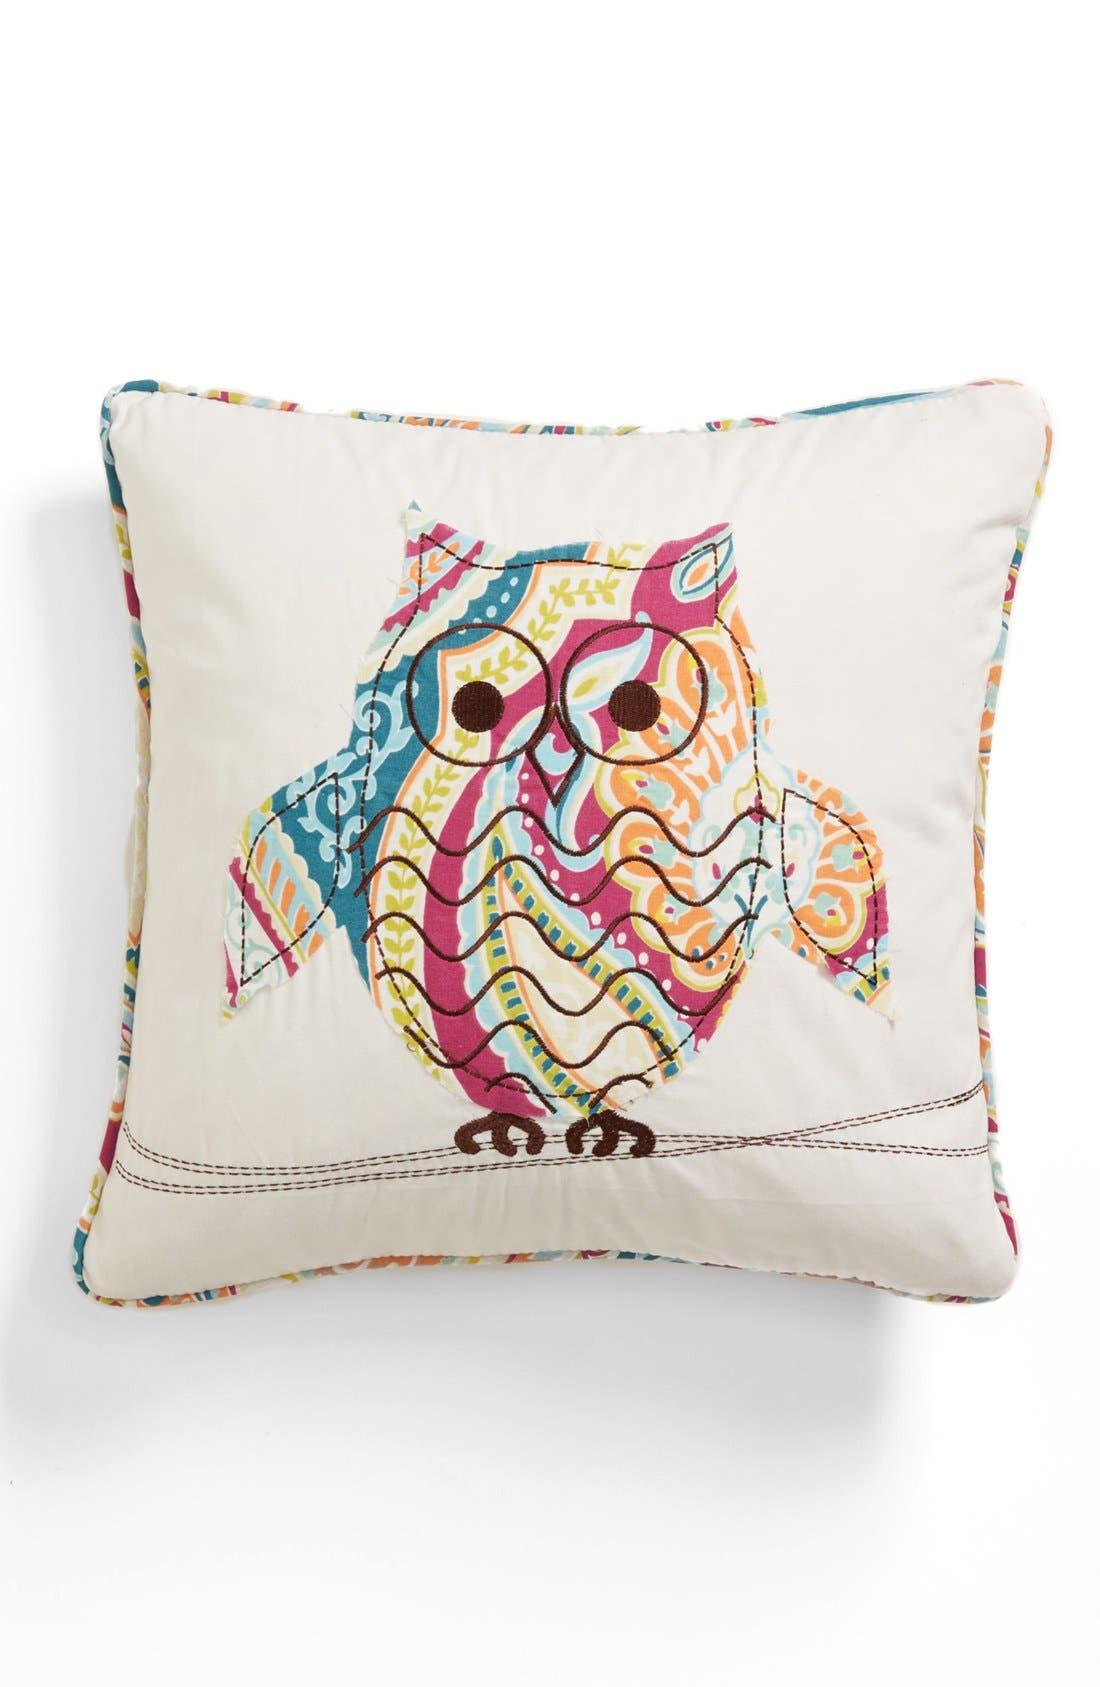 Main Image - Levtex 'Magnolia Owl' Pillow